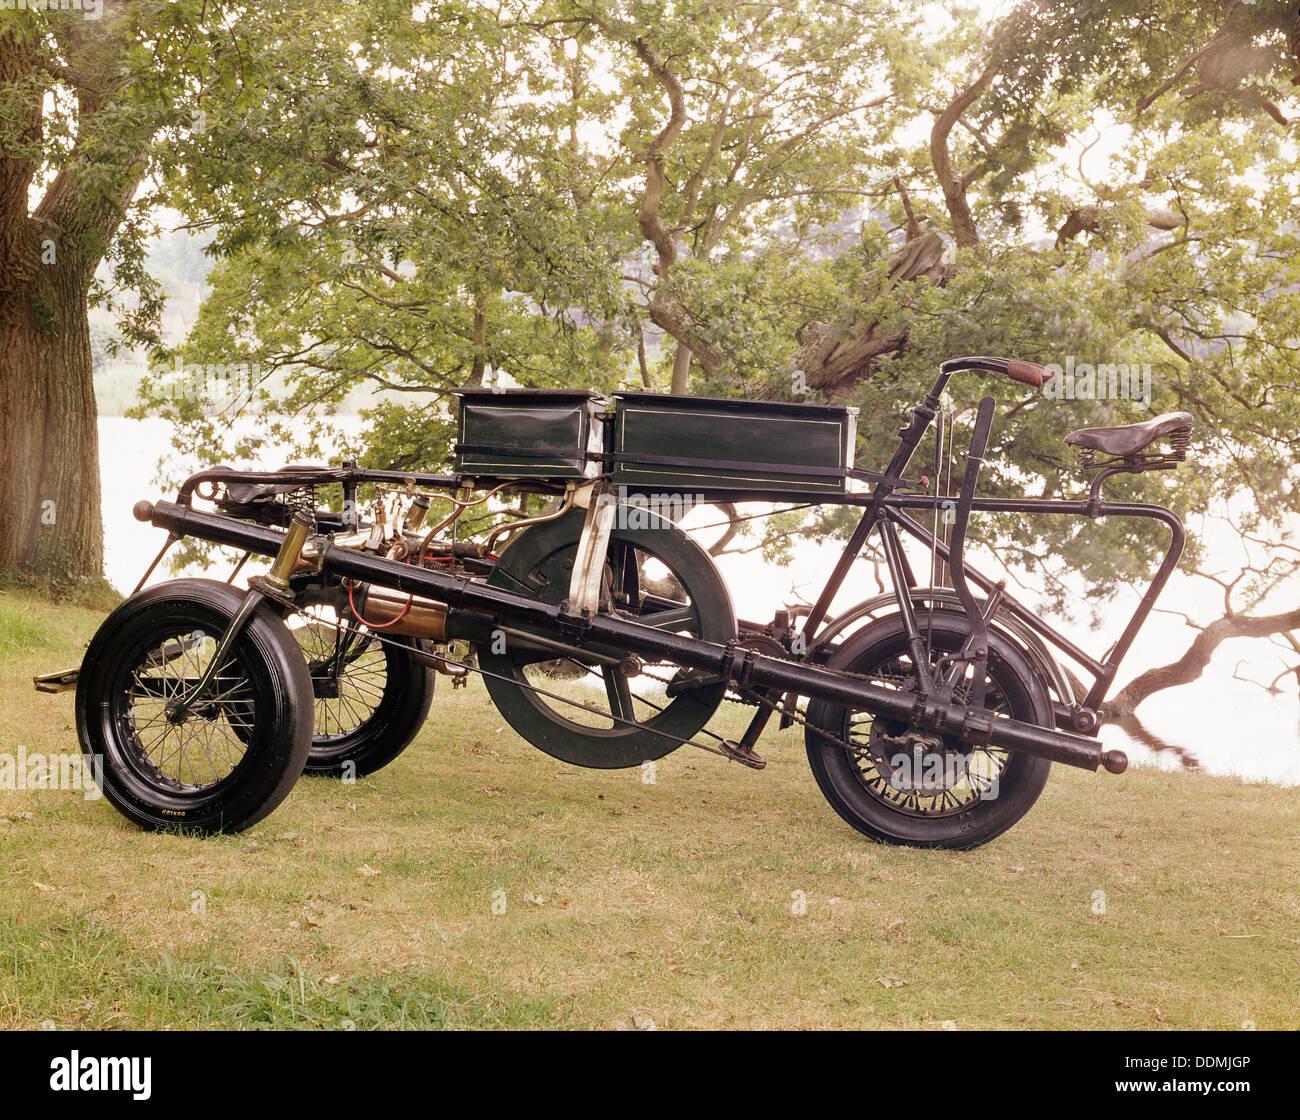 An 1896 Pennington motor-tricycle. - Stock Image